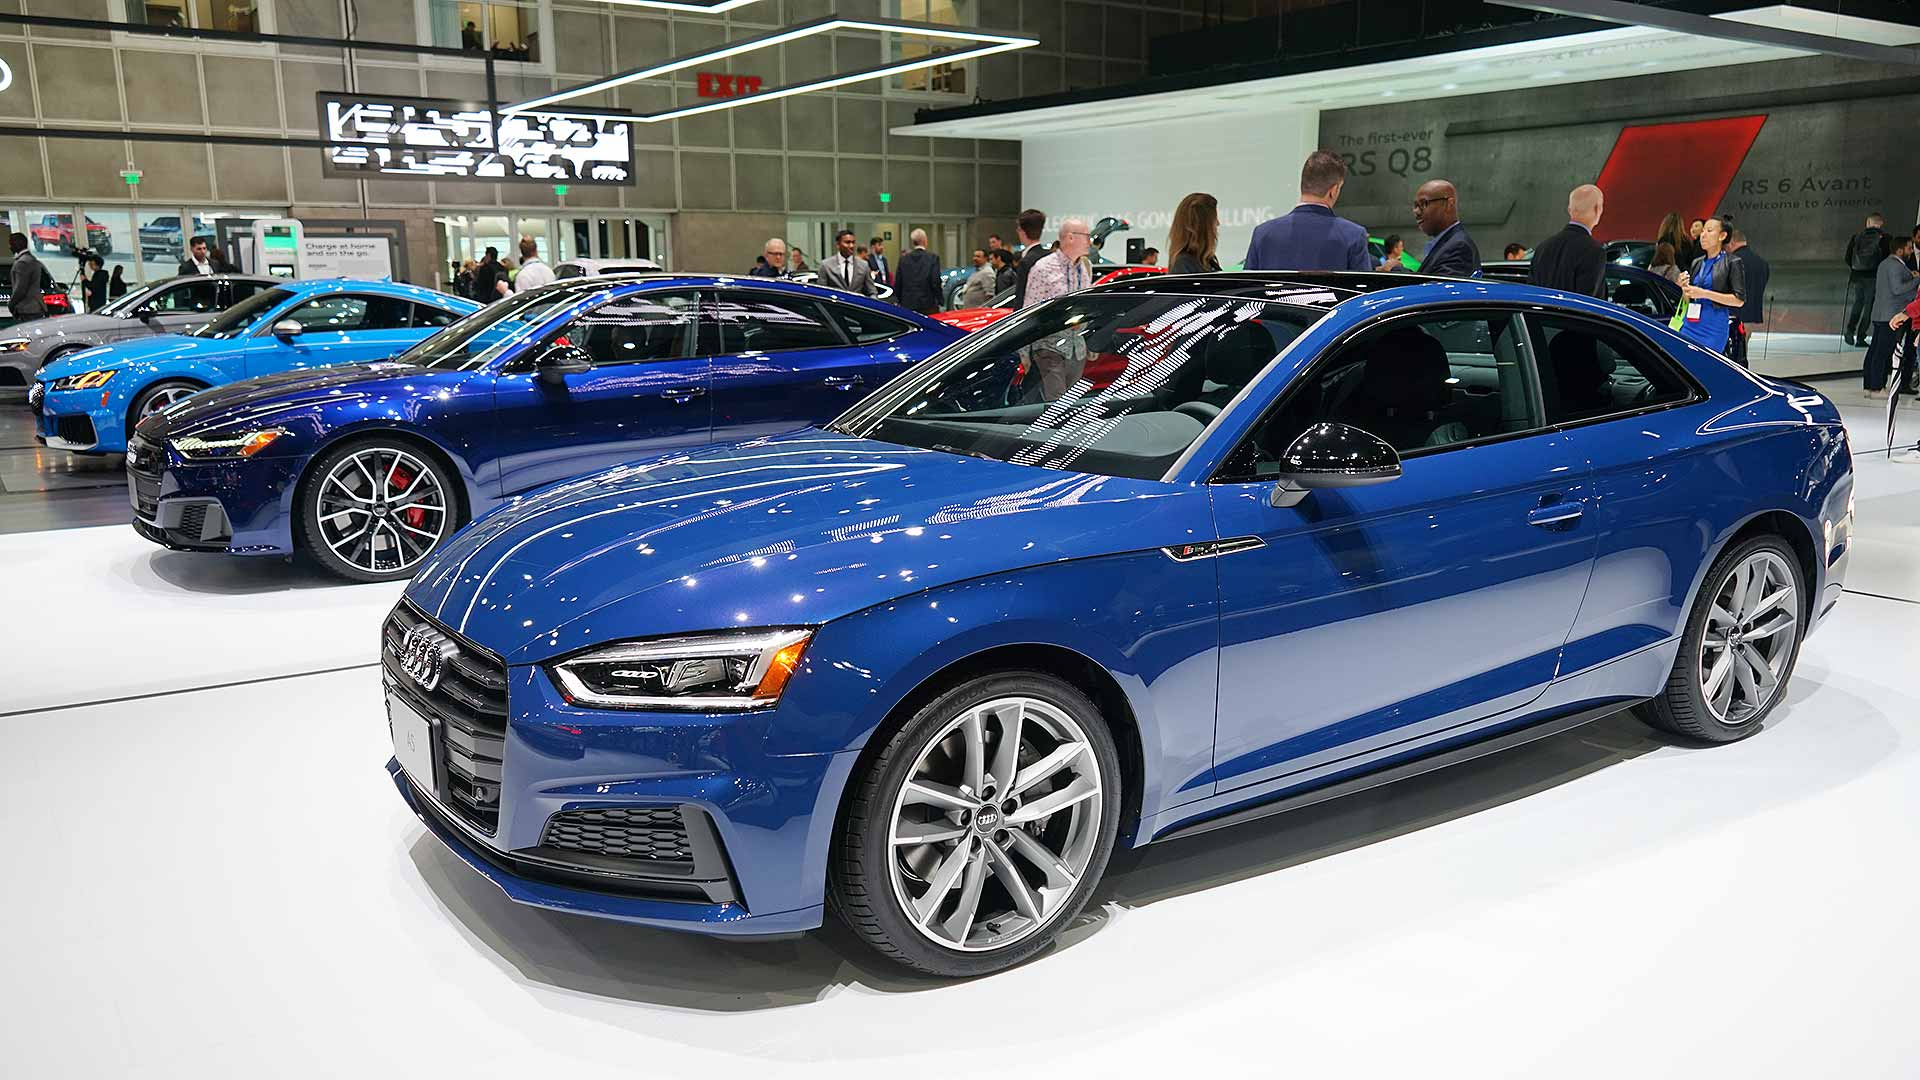 Audi's three shades of blue